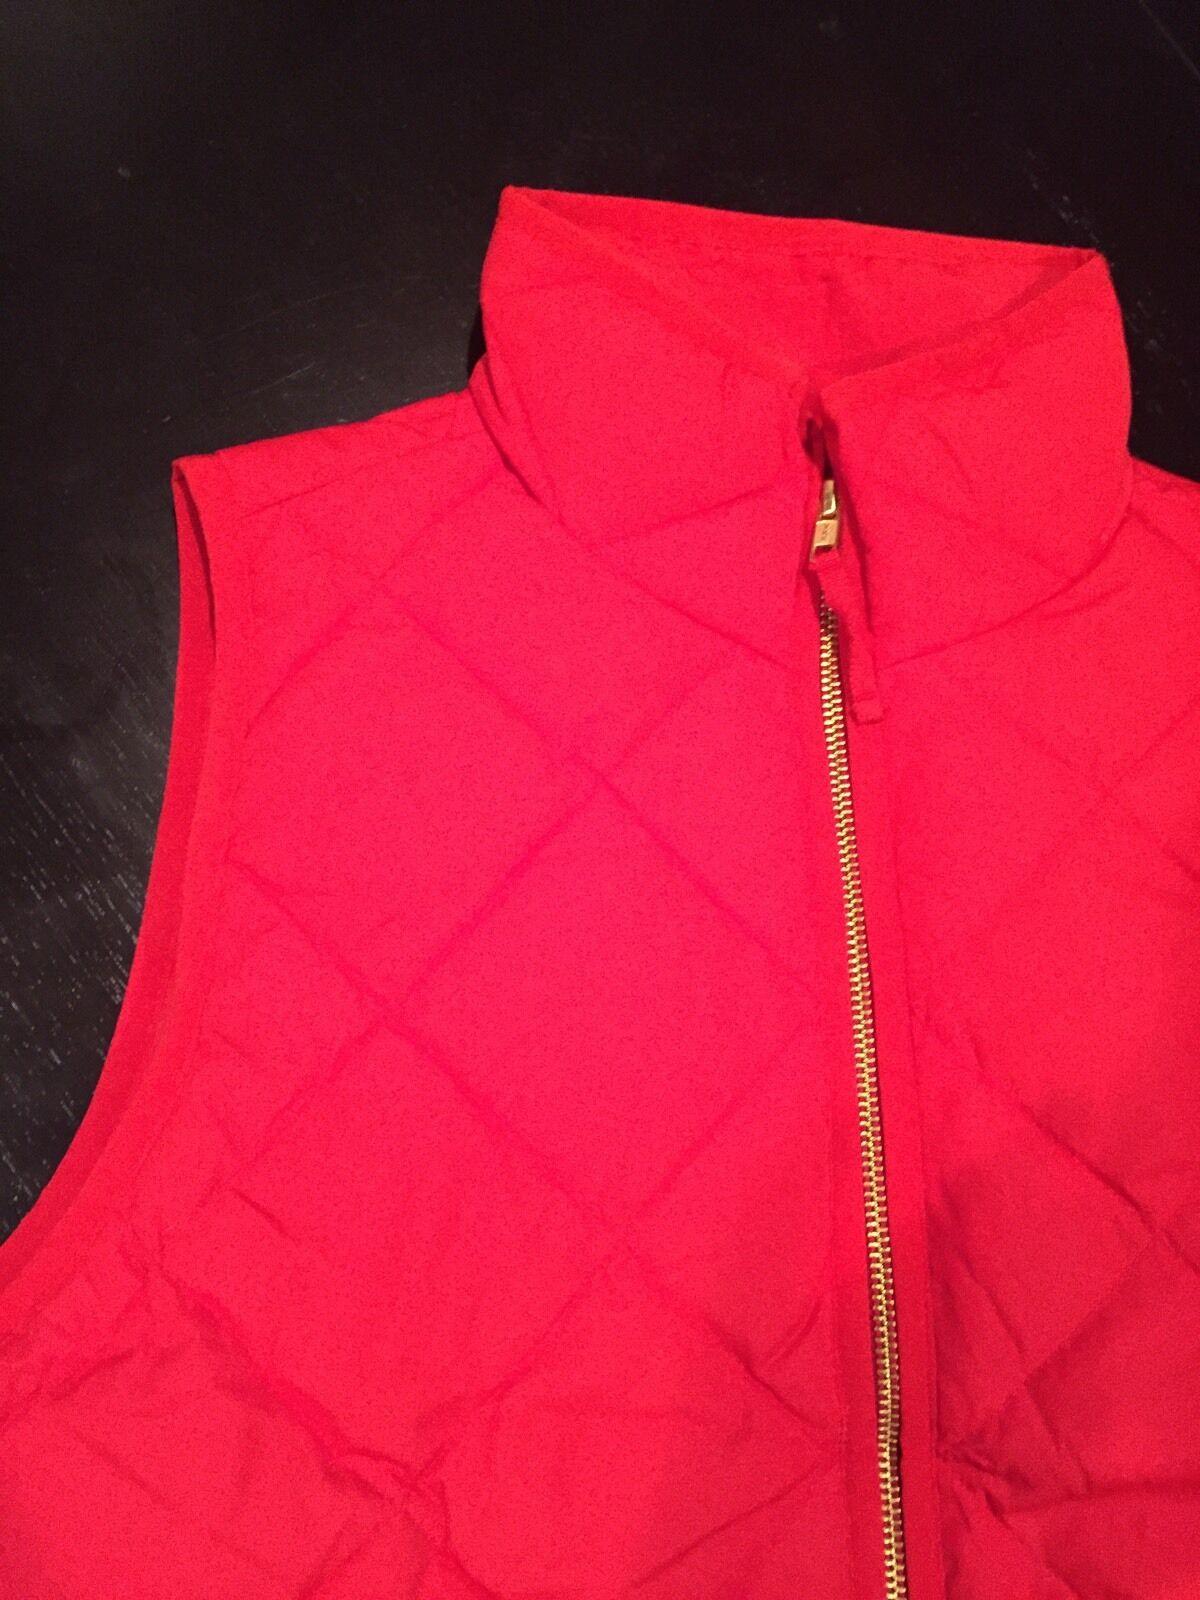 J.CREW Xxs NEW Excursion Vest Dark Poppy Red Quilted Down Puffer NWT Xxs